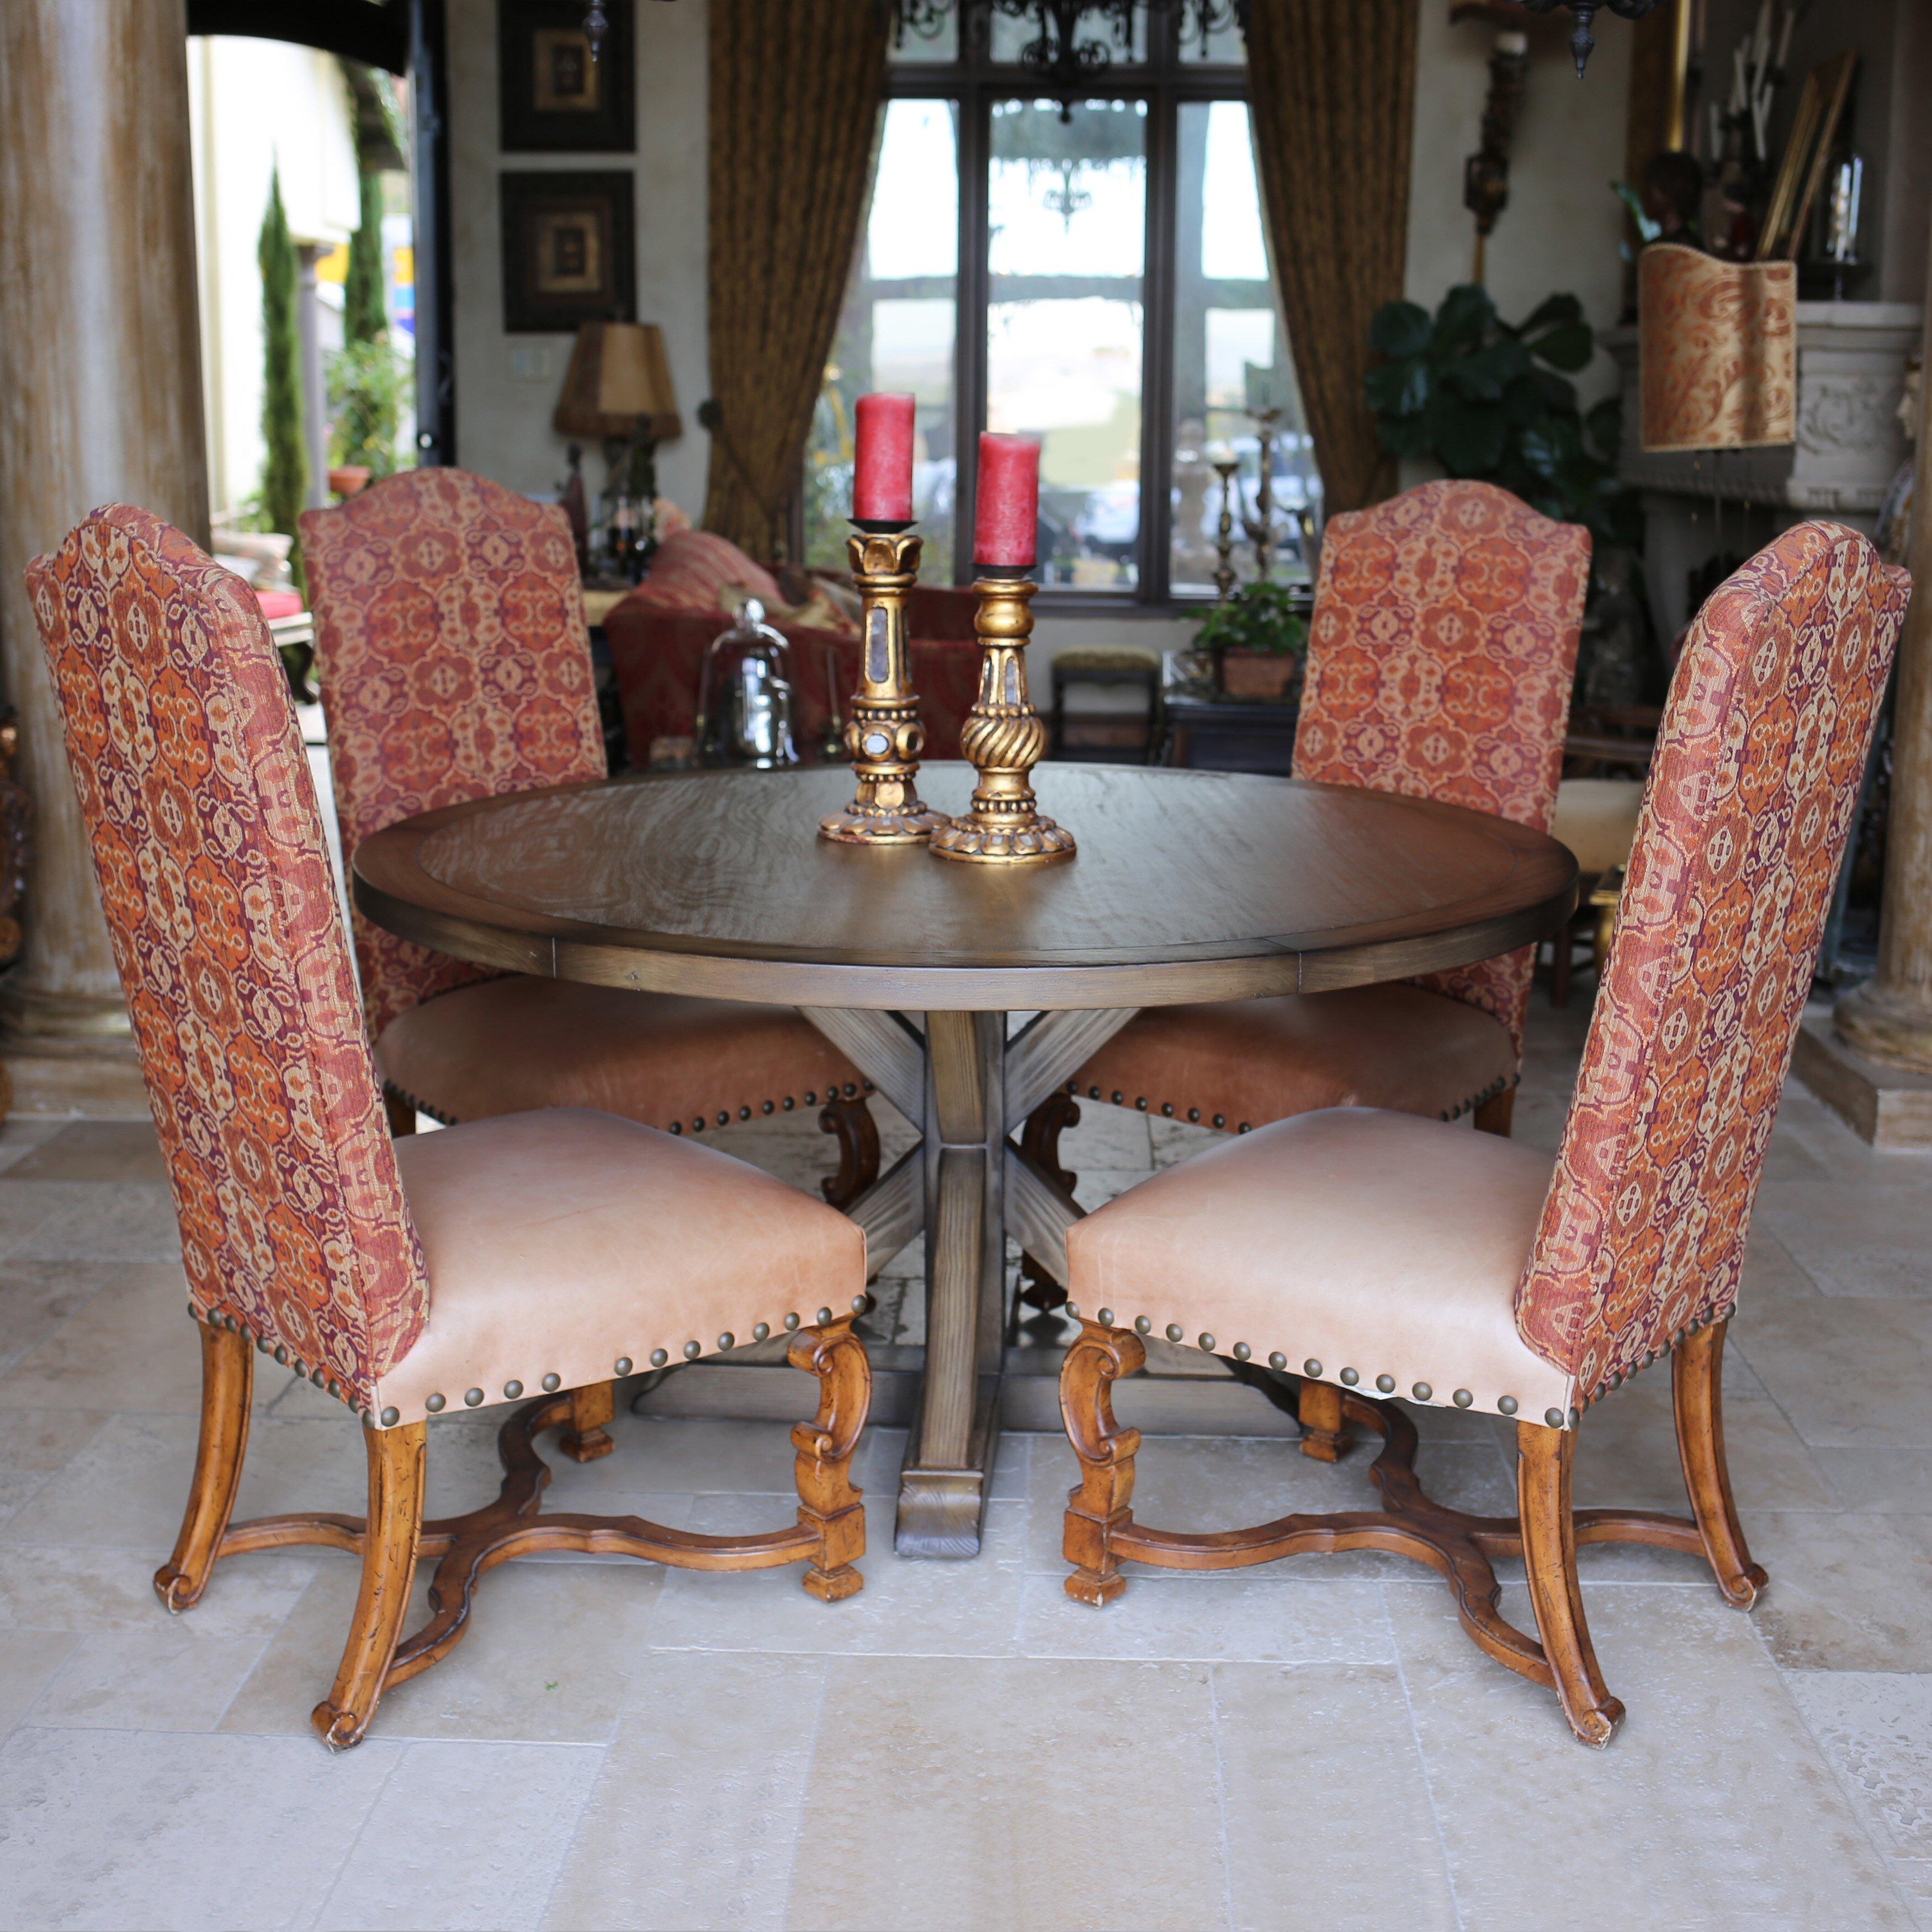 Kovethospitality Larue Reclaimed Wood Round Dining Table Reviews. Modus Portland Solid Wood Round Dining Table Medium Walnut Wood